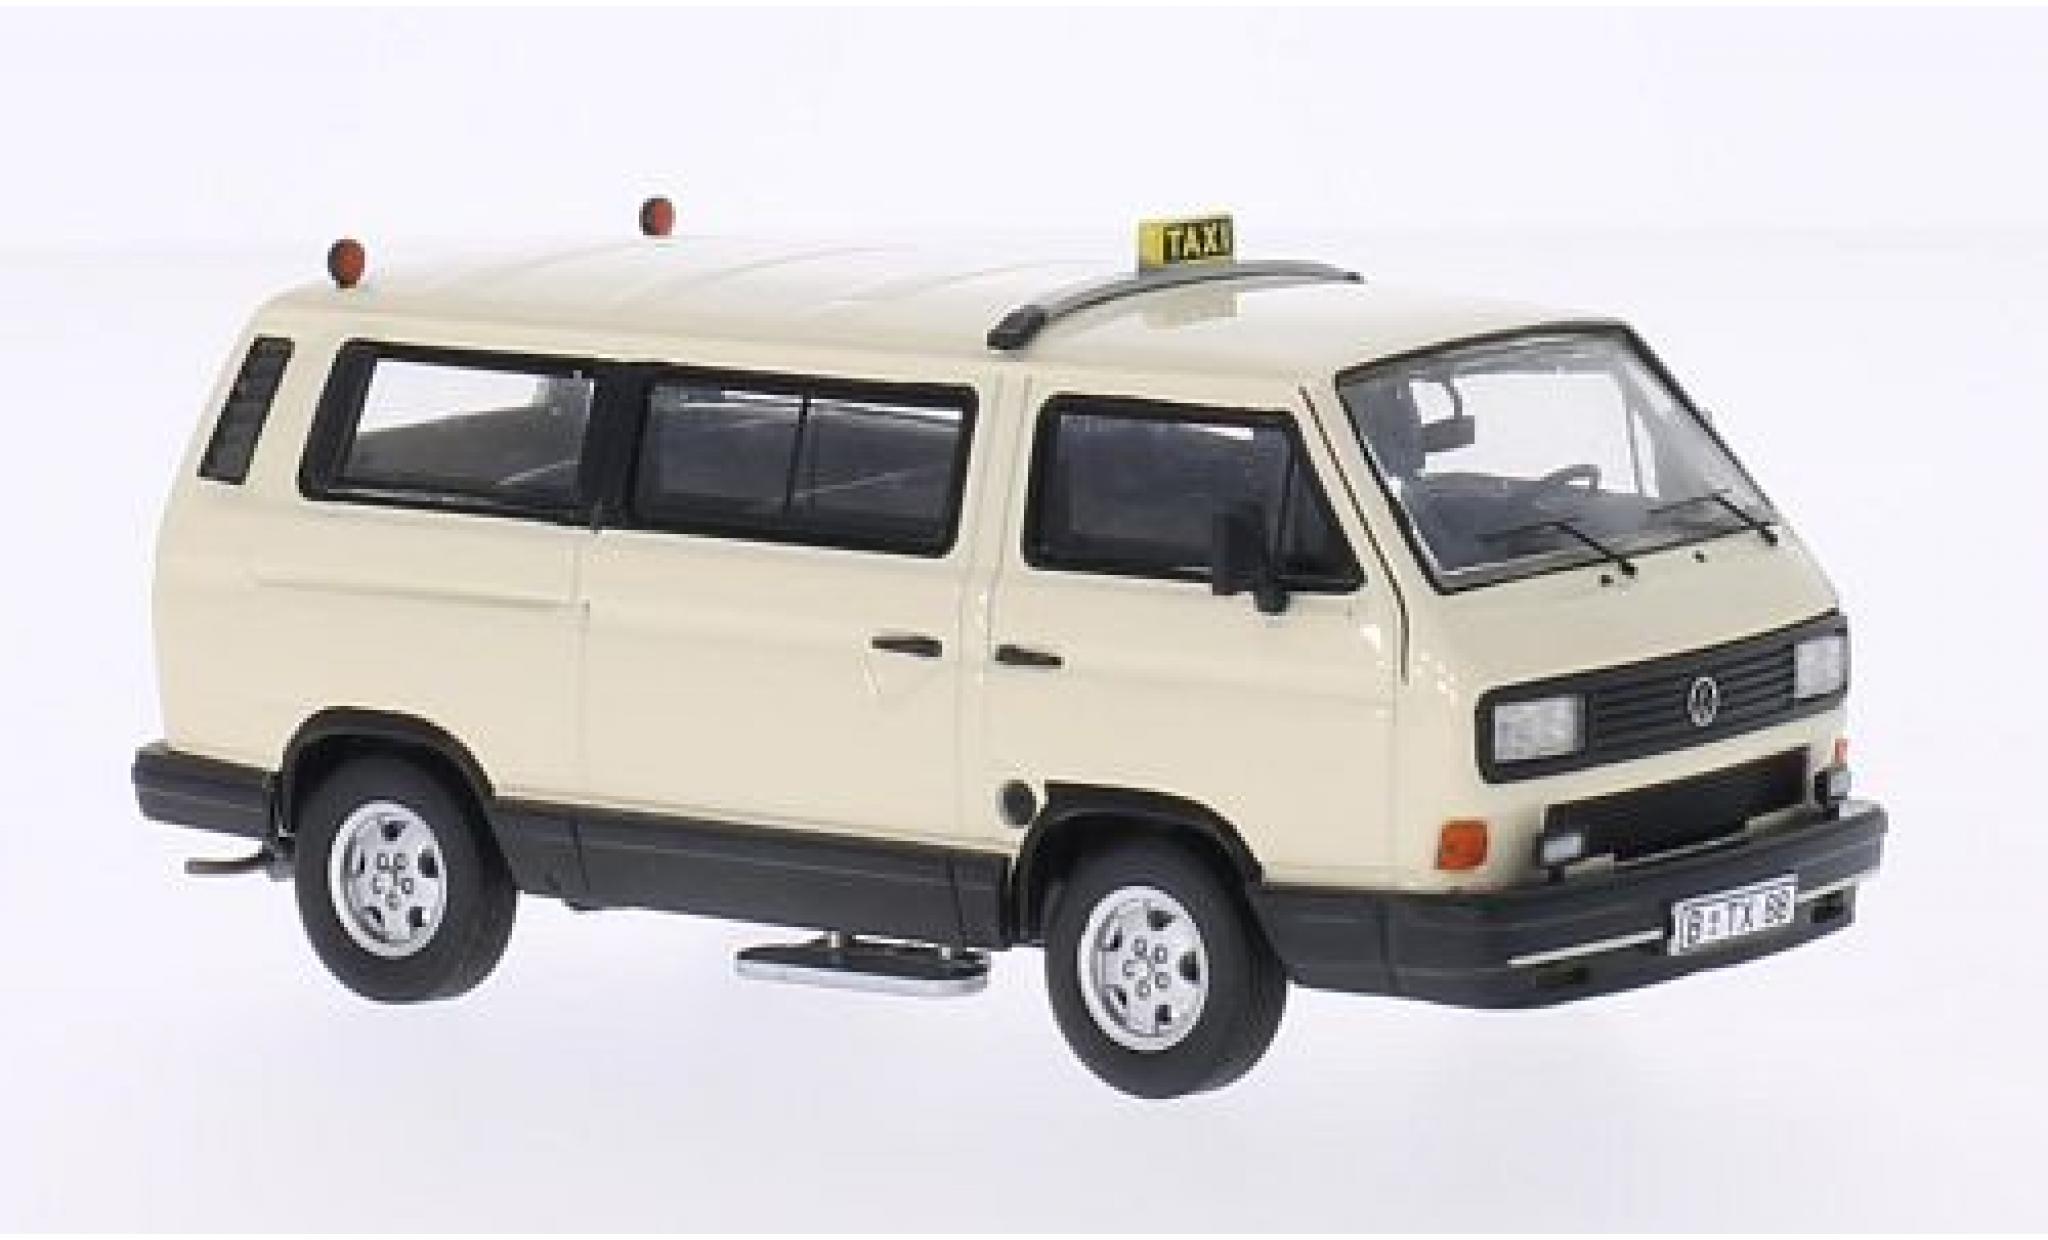 Volkswagen T3 1/43 Premium ClassiXXs b Taxi bus